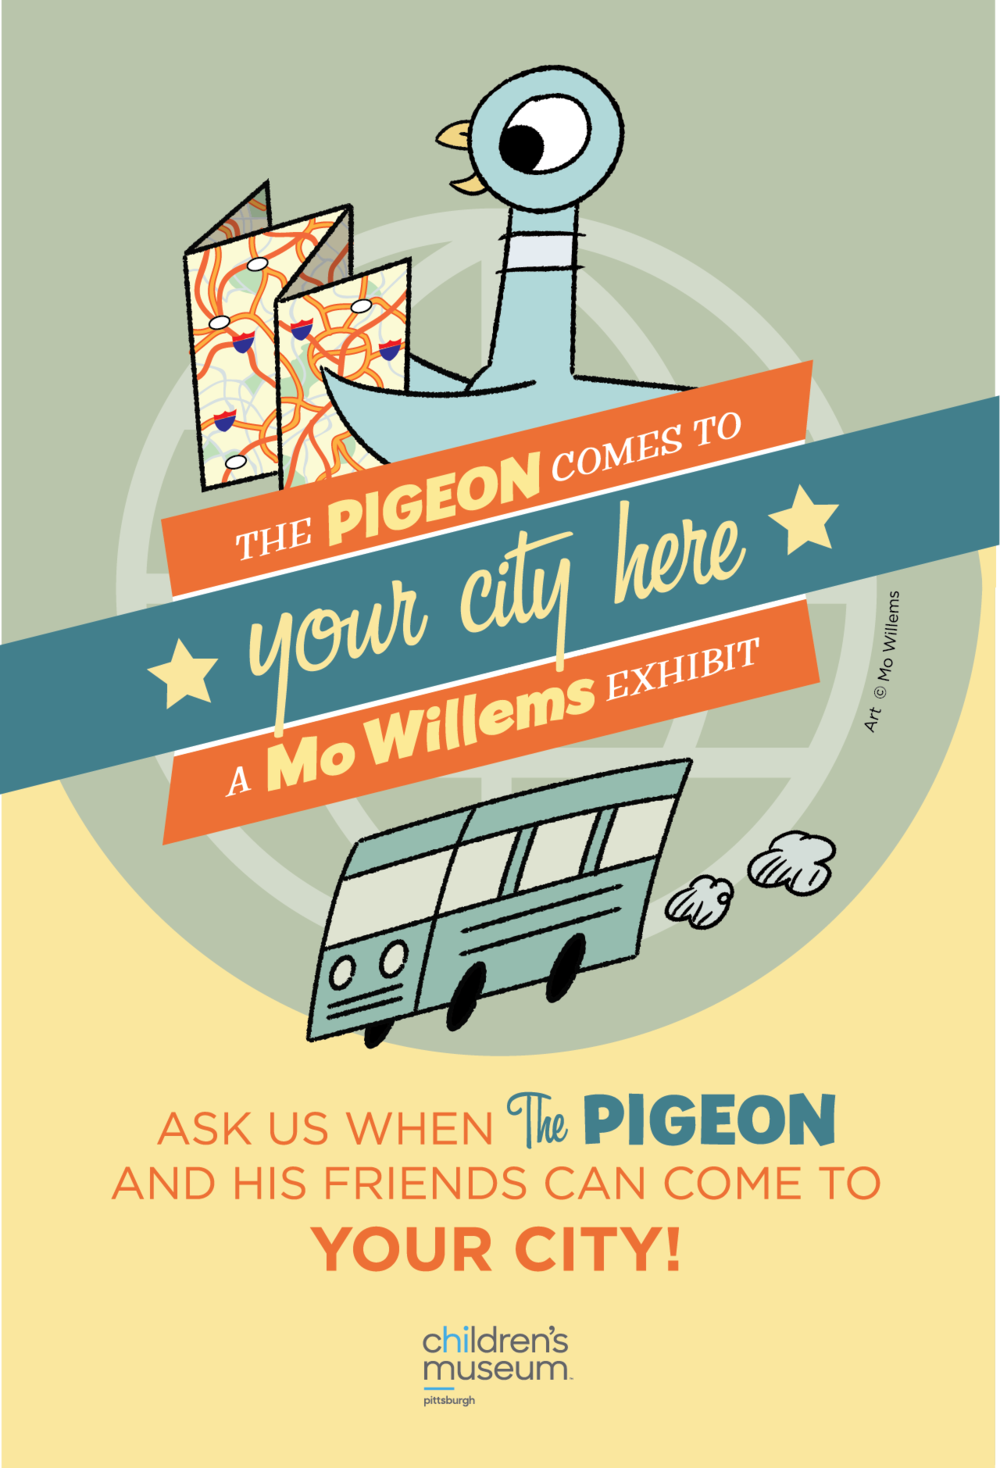 CMP_Pigeon_booth_postcard-01_FINAL_X1-a_no-crops.png